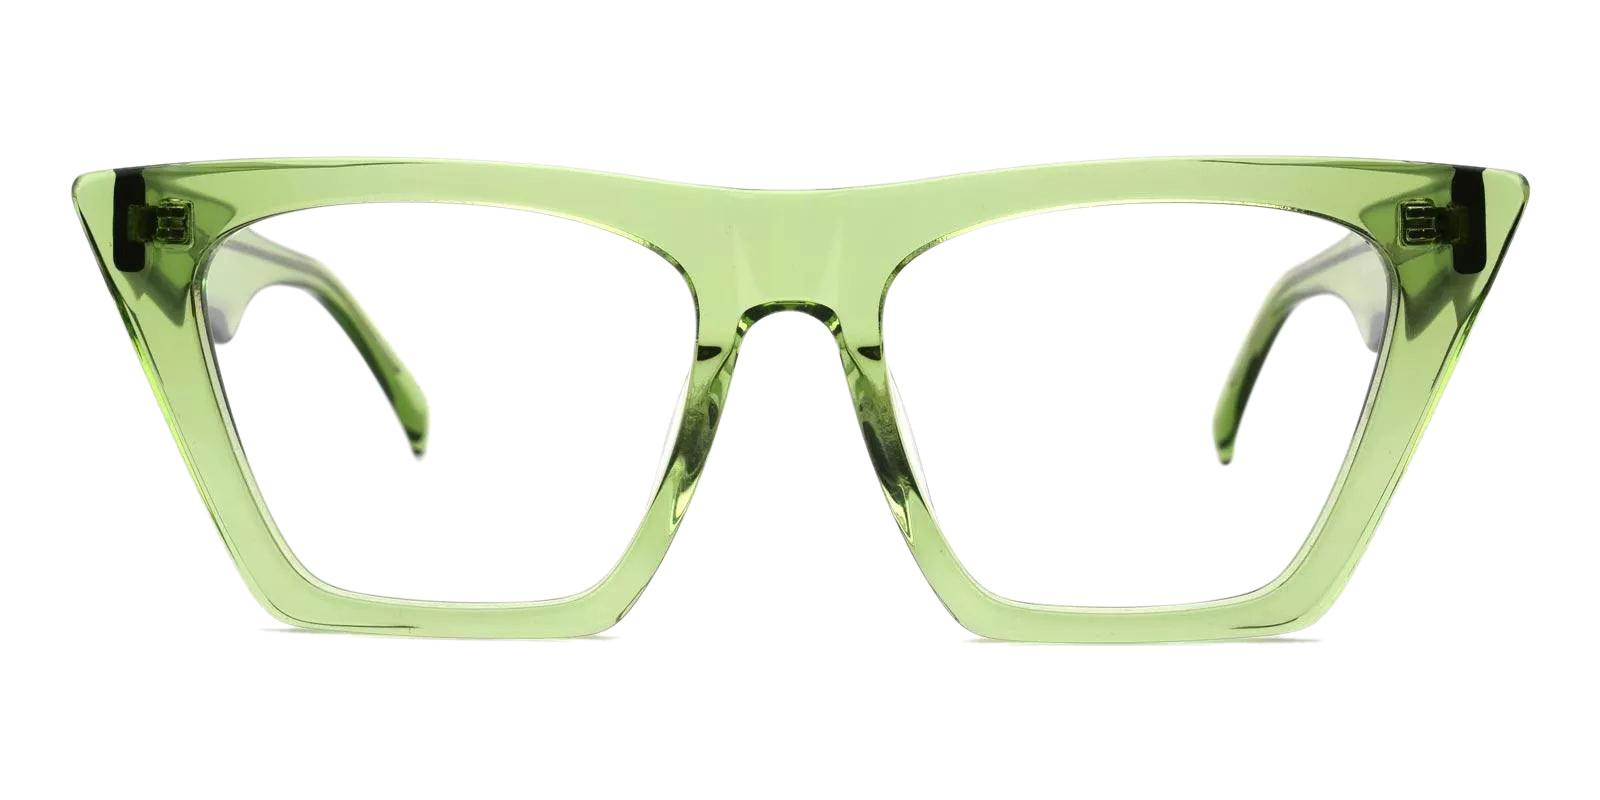 Haley Green Acetate Eyeglasses , Fashion , UniversalBridgeFit Frames from ABBE Glasses